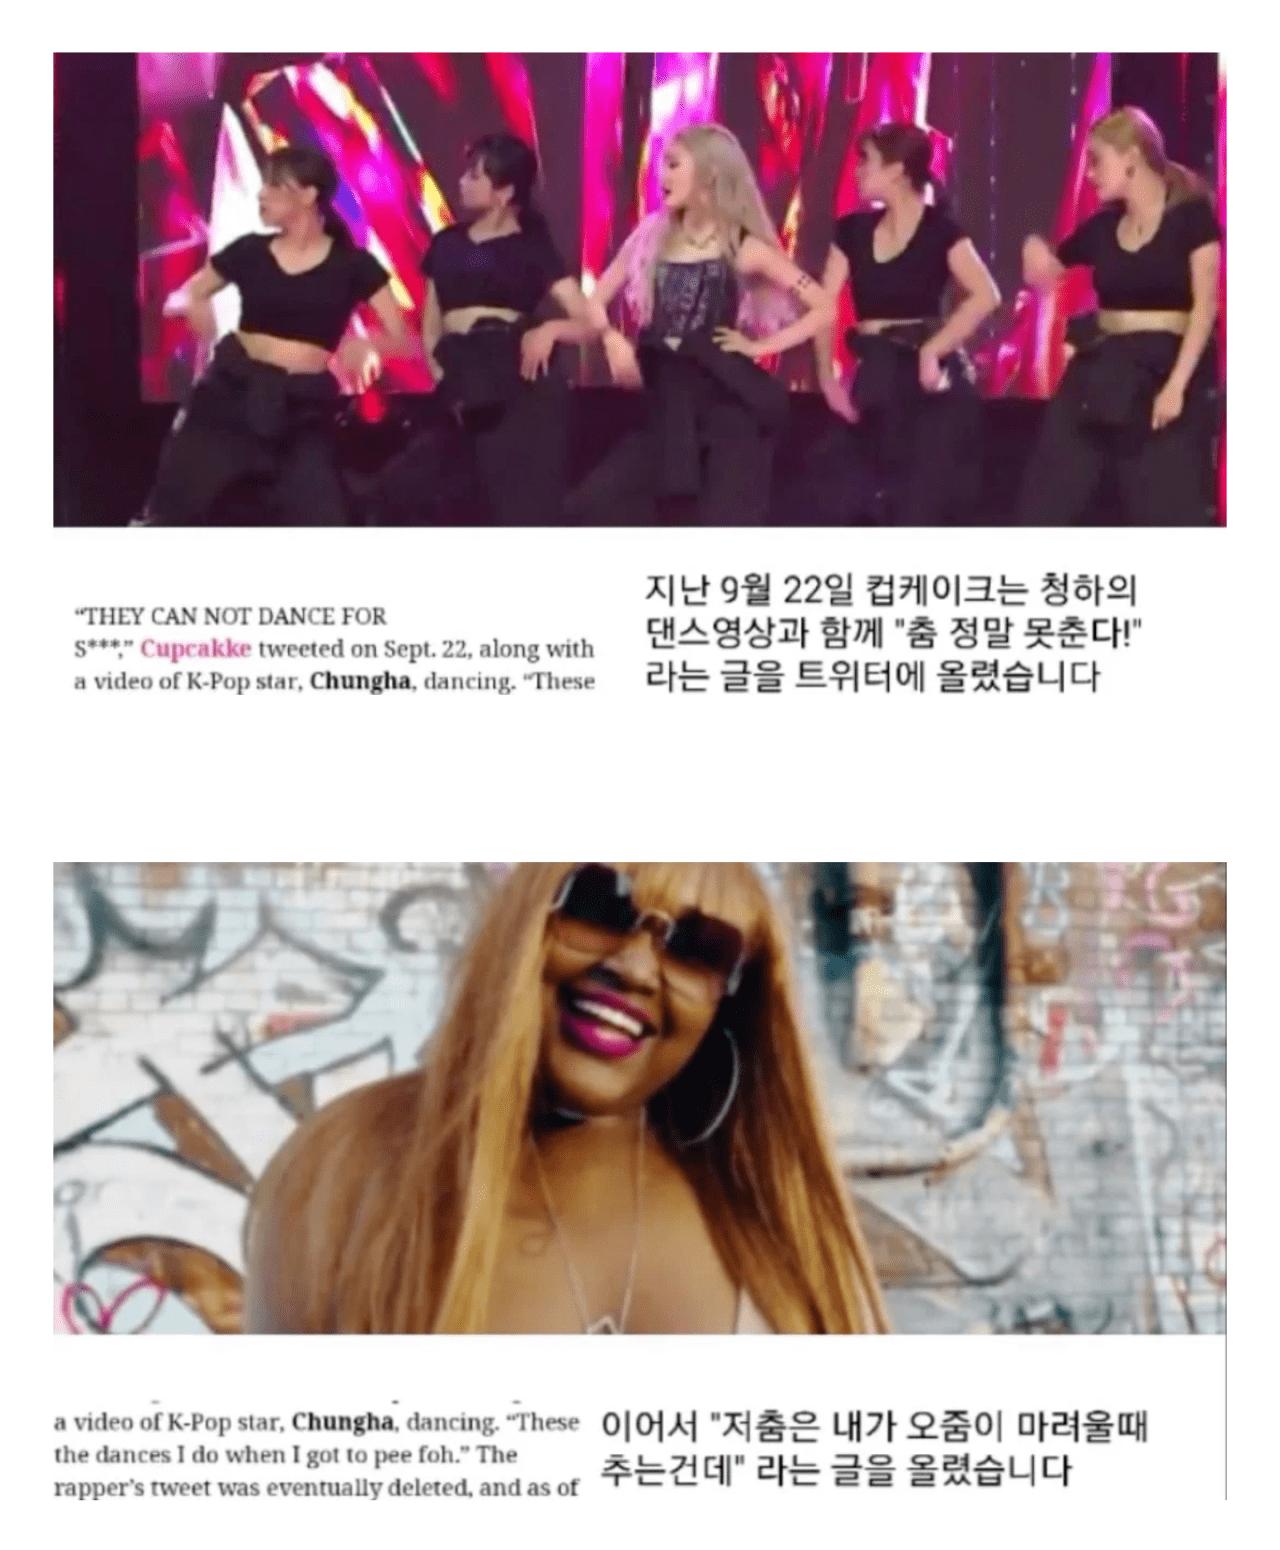 Screenshot_20191010-170513(1).png 혐) 미국 래퍼에게 춤 못춘다고 디스당한 청하